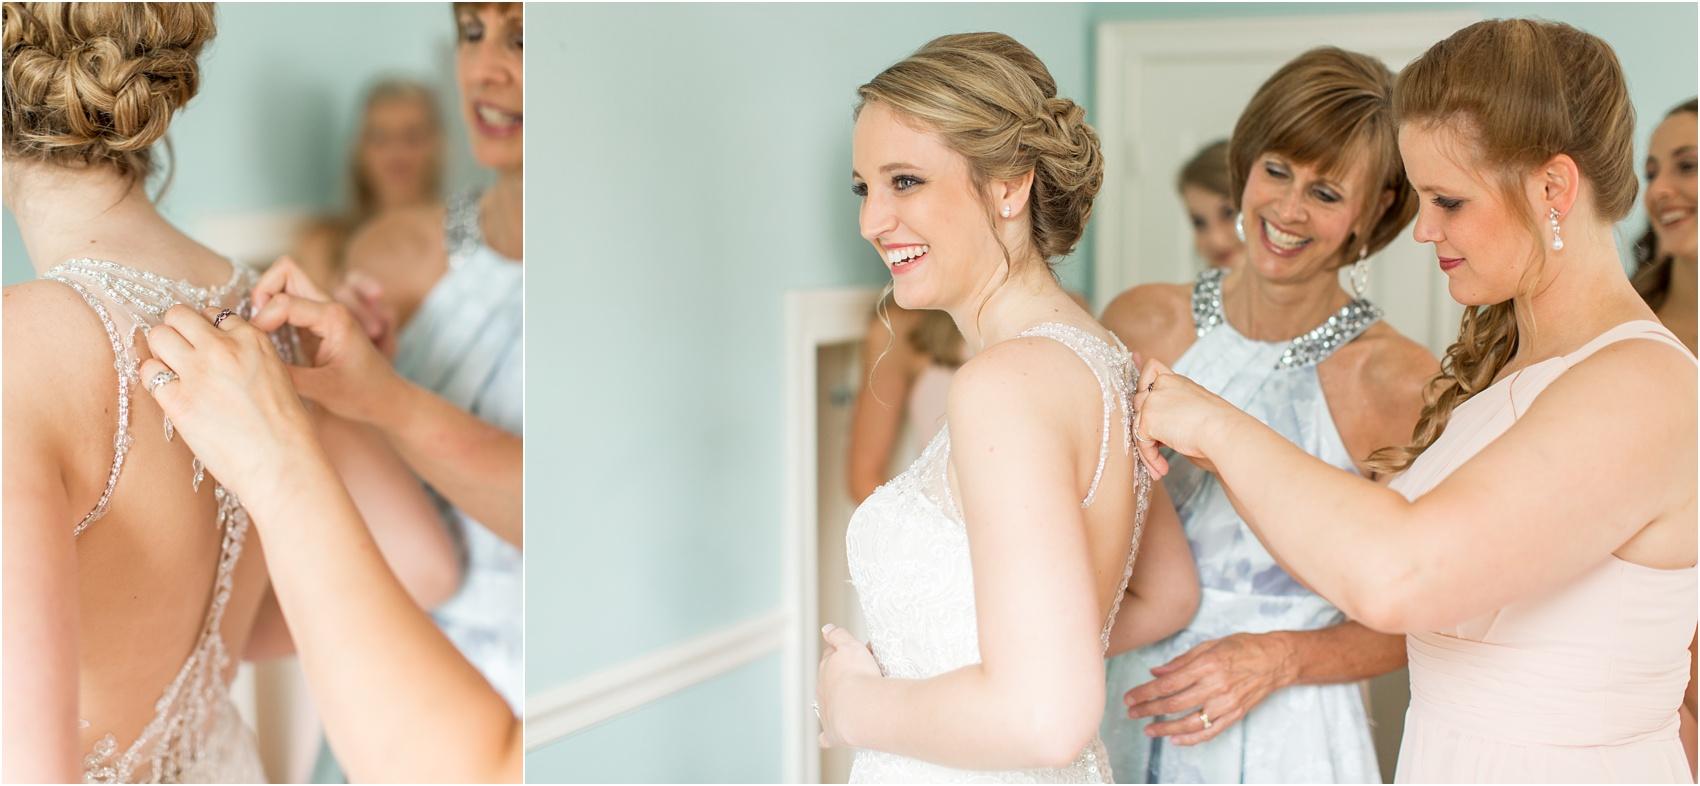 Savannah Eve Photography- Roper-Powell Wedding- Blog-11.jpg